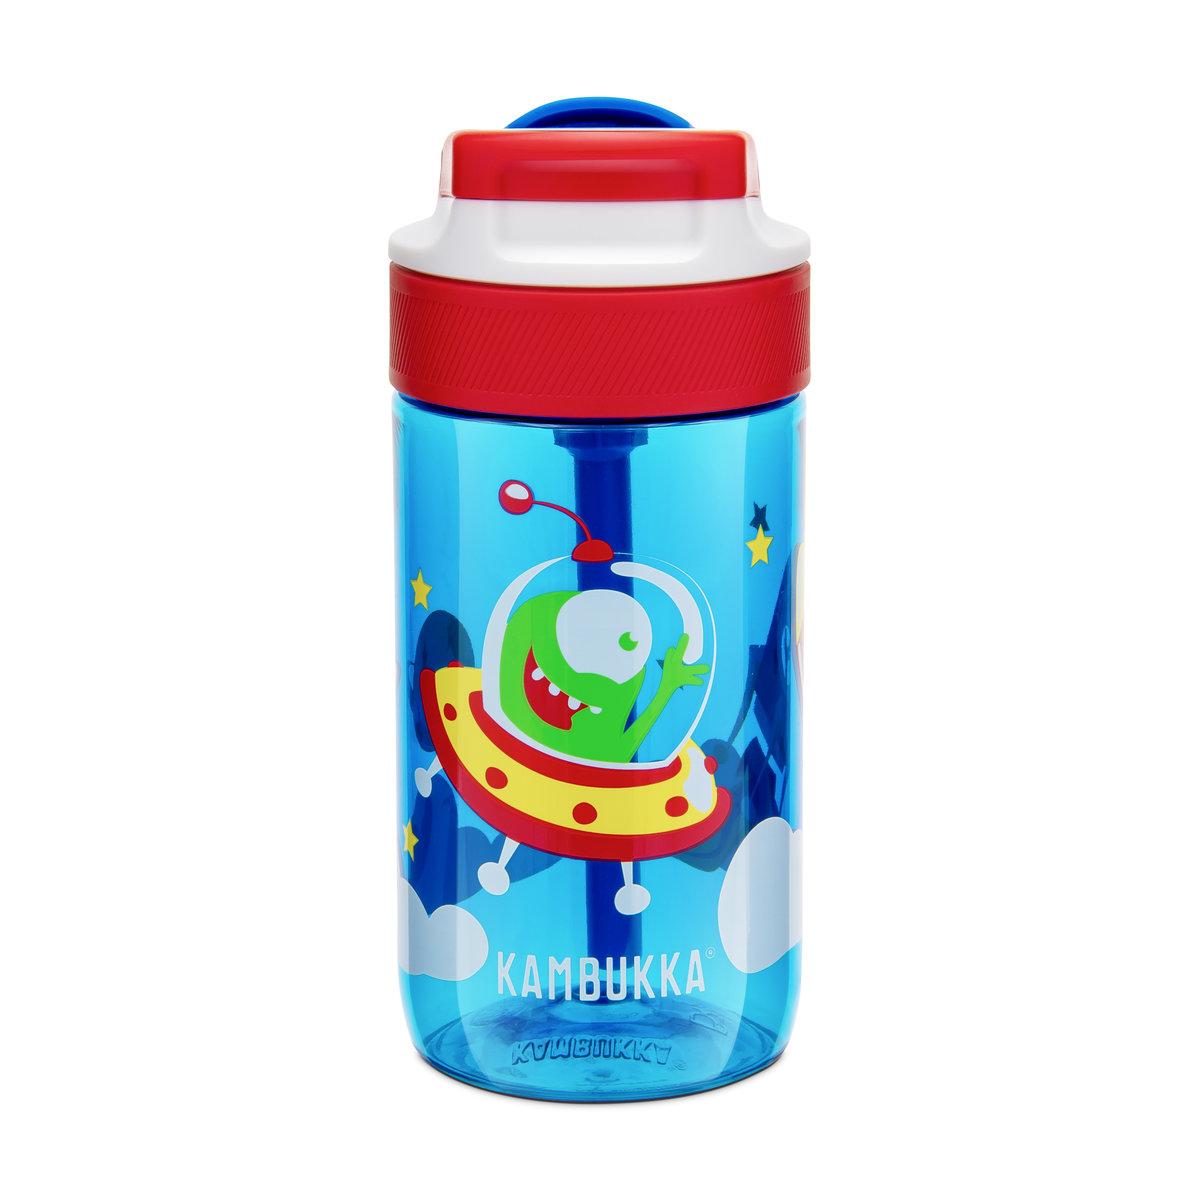 Kambukka 藍湖兒童吸管杯 (Tritan) 14oz (400ml) – 天空藍色+愉快外星人圖案